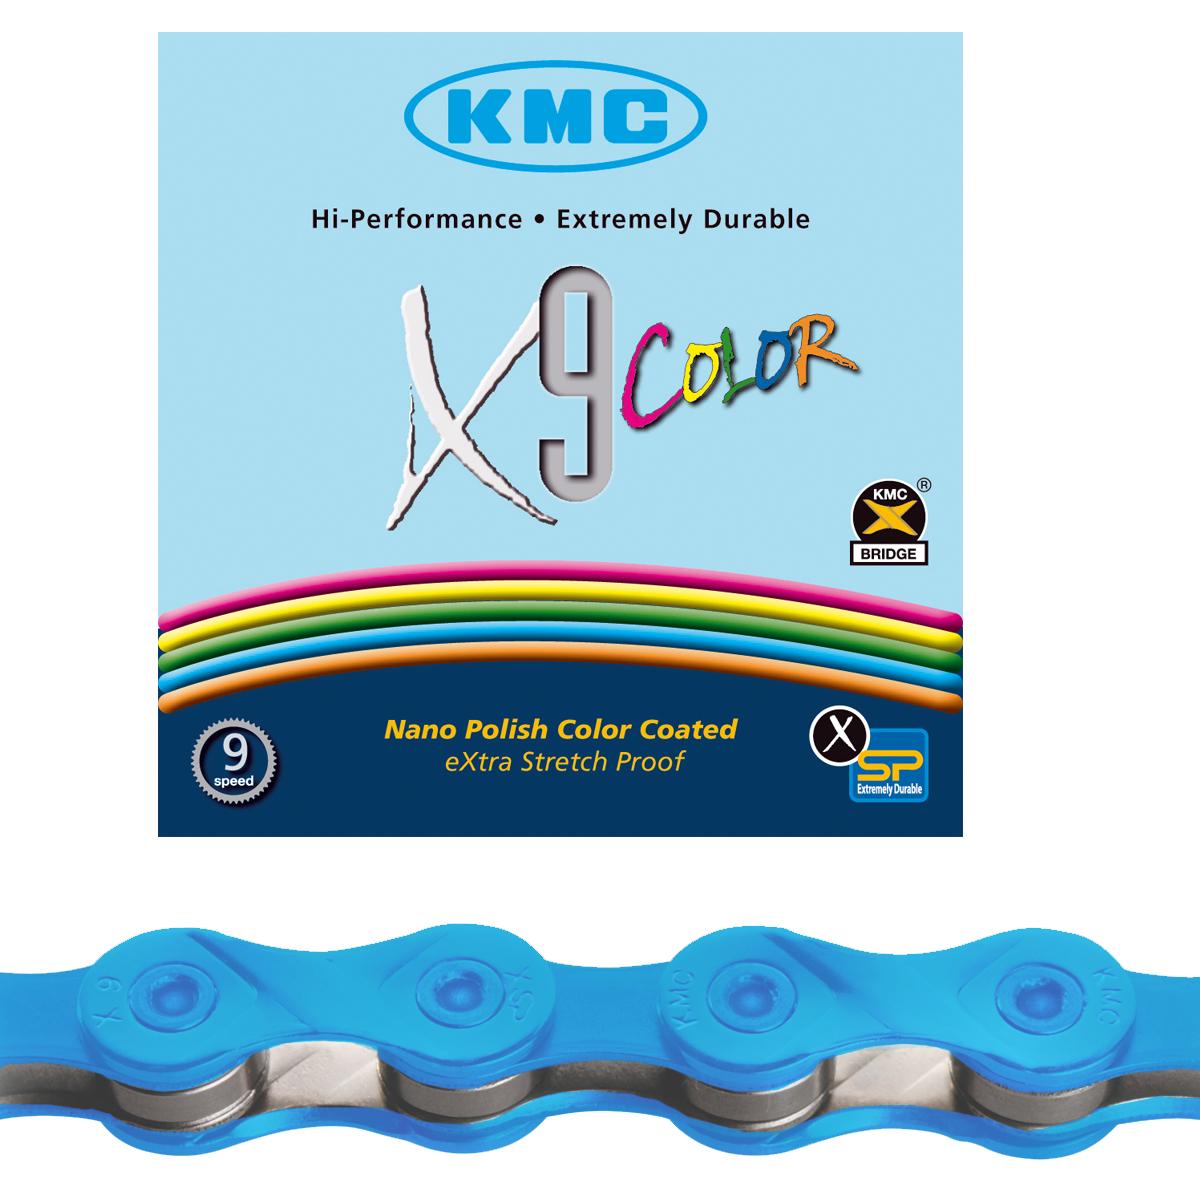 Chaîne vélo KMC X9 Color 9V 116 maillons Bleu